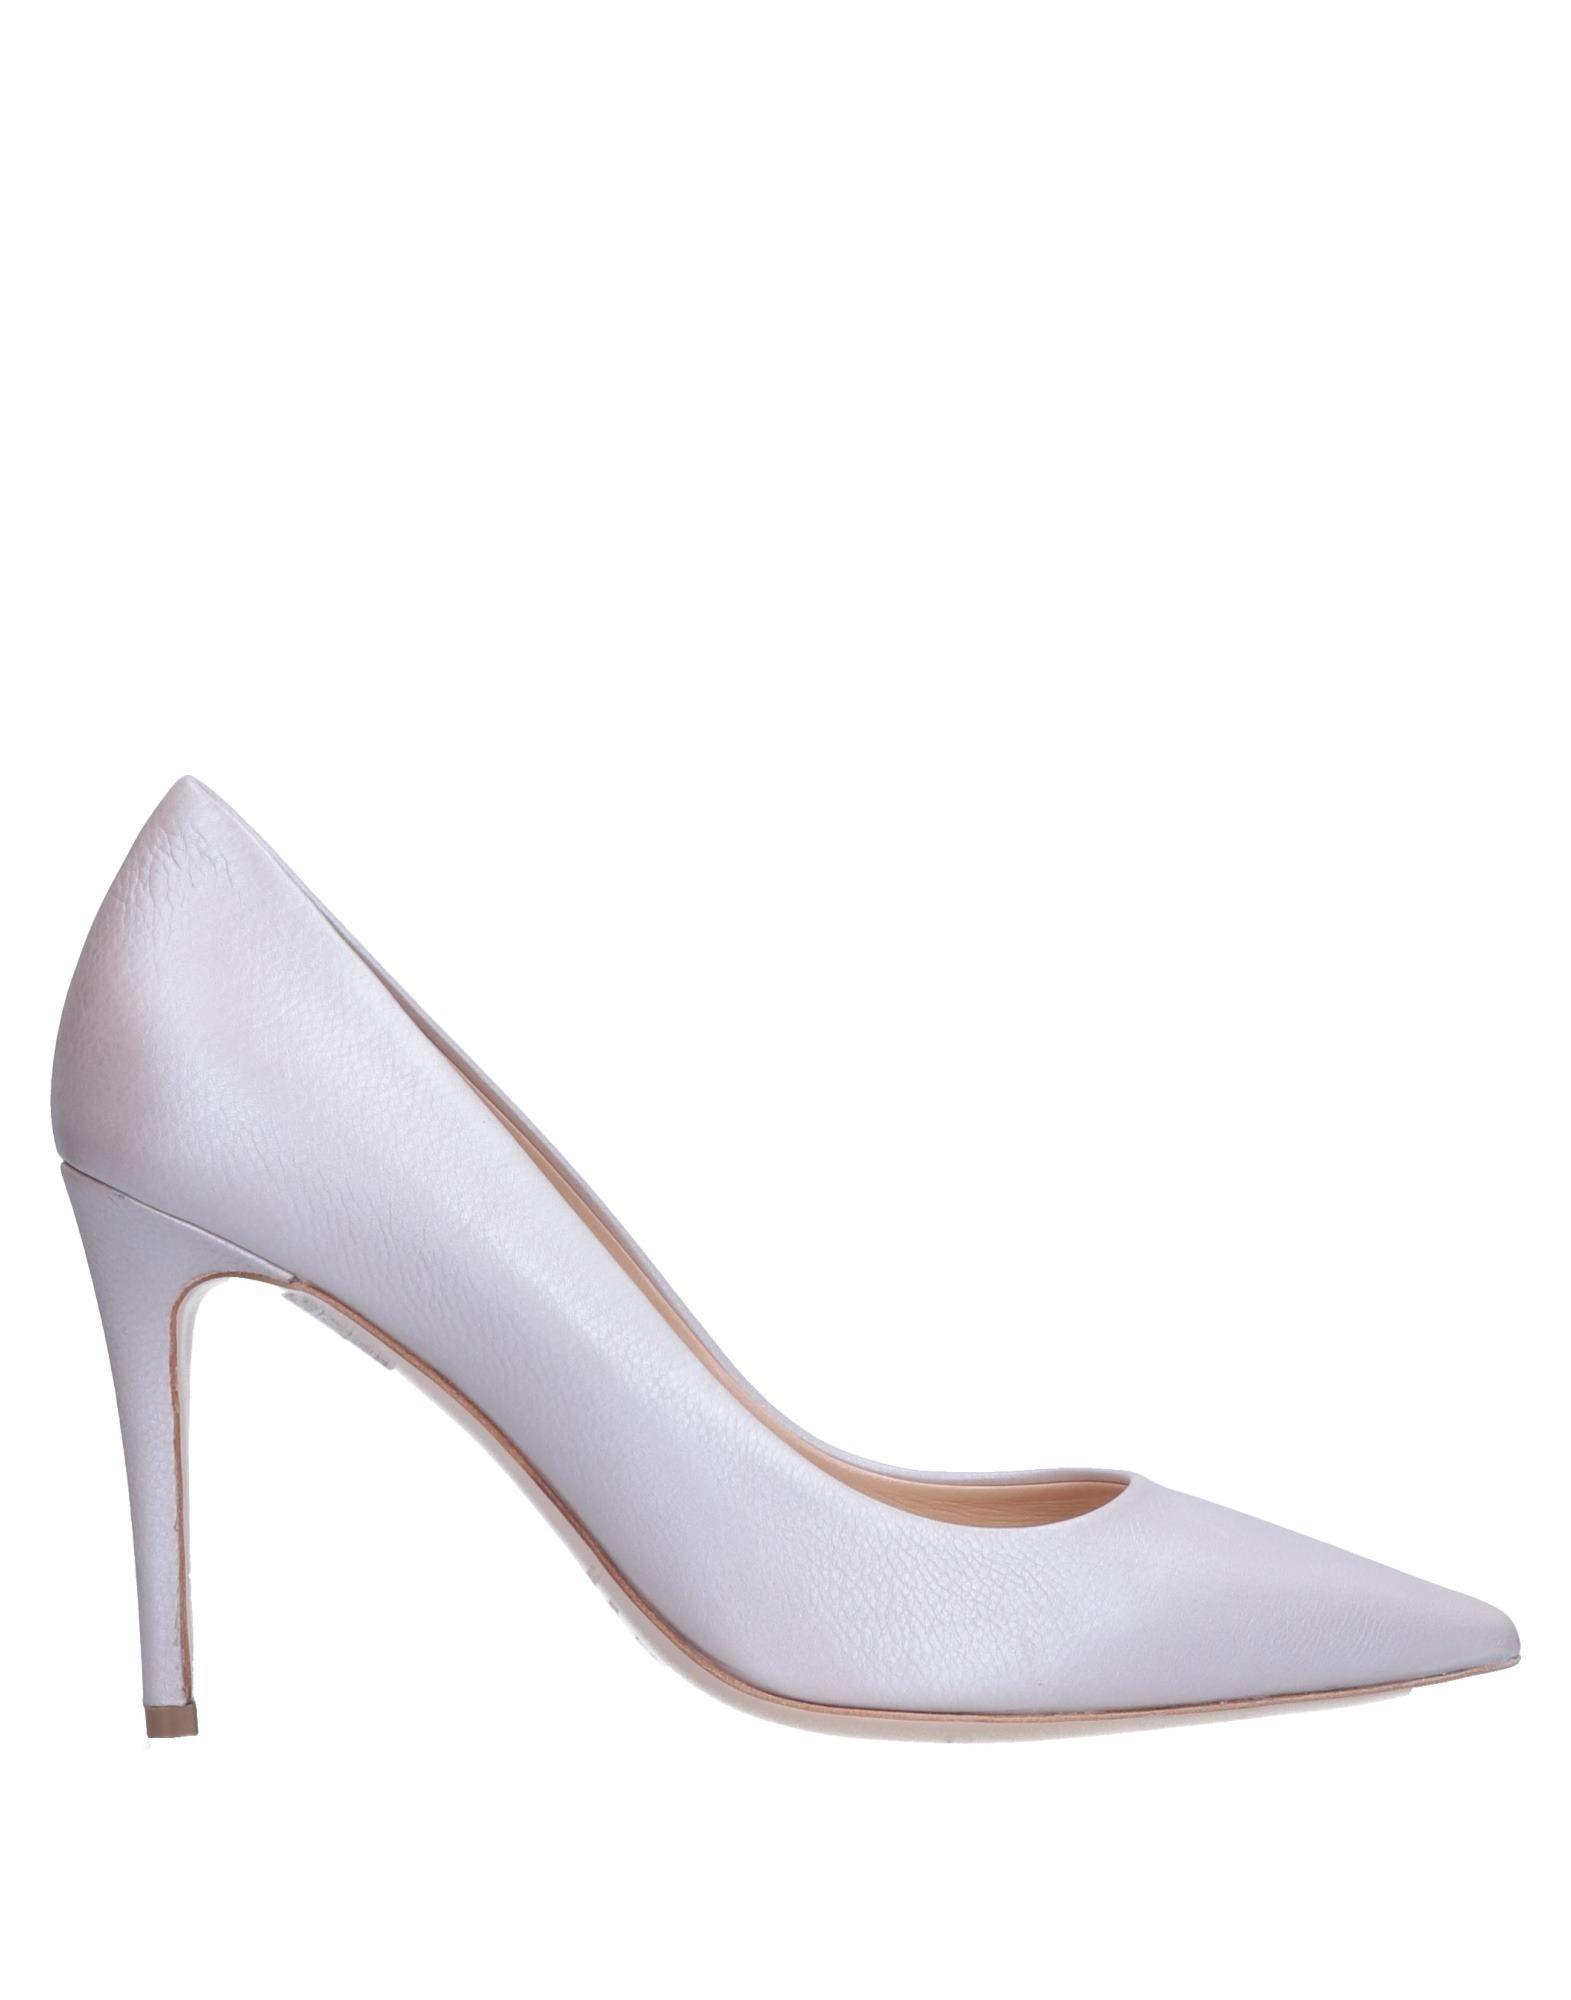 Stilvolle billige Pumps Schuhe Deimille Pumps billige Damen  11551155SM e9efba